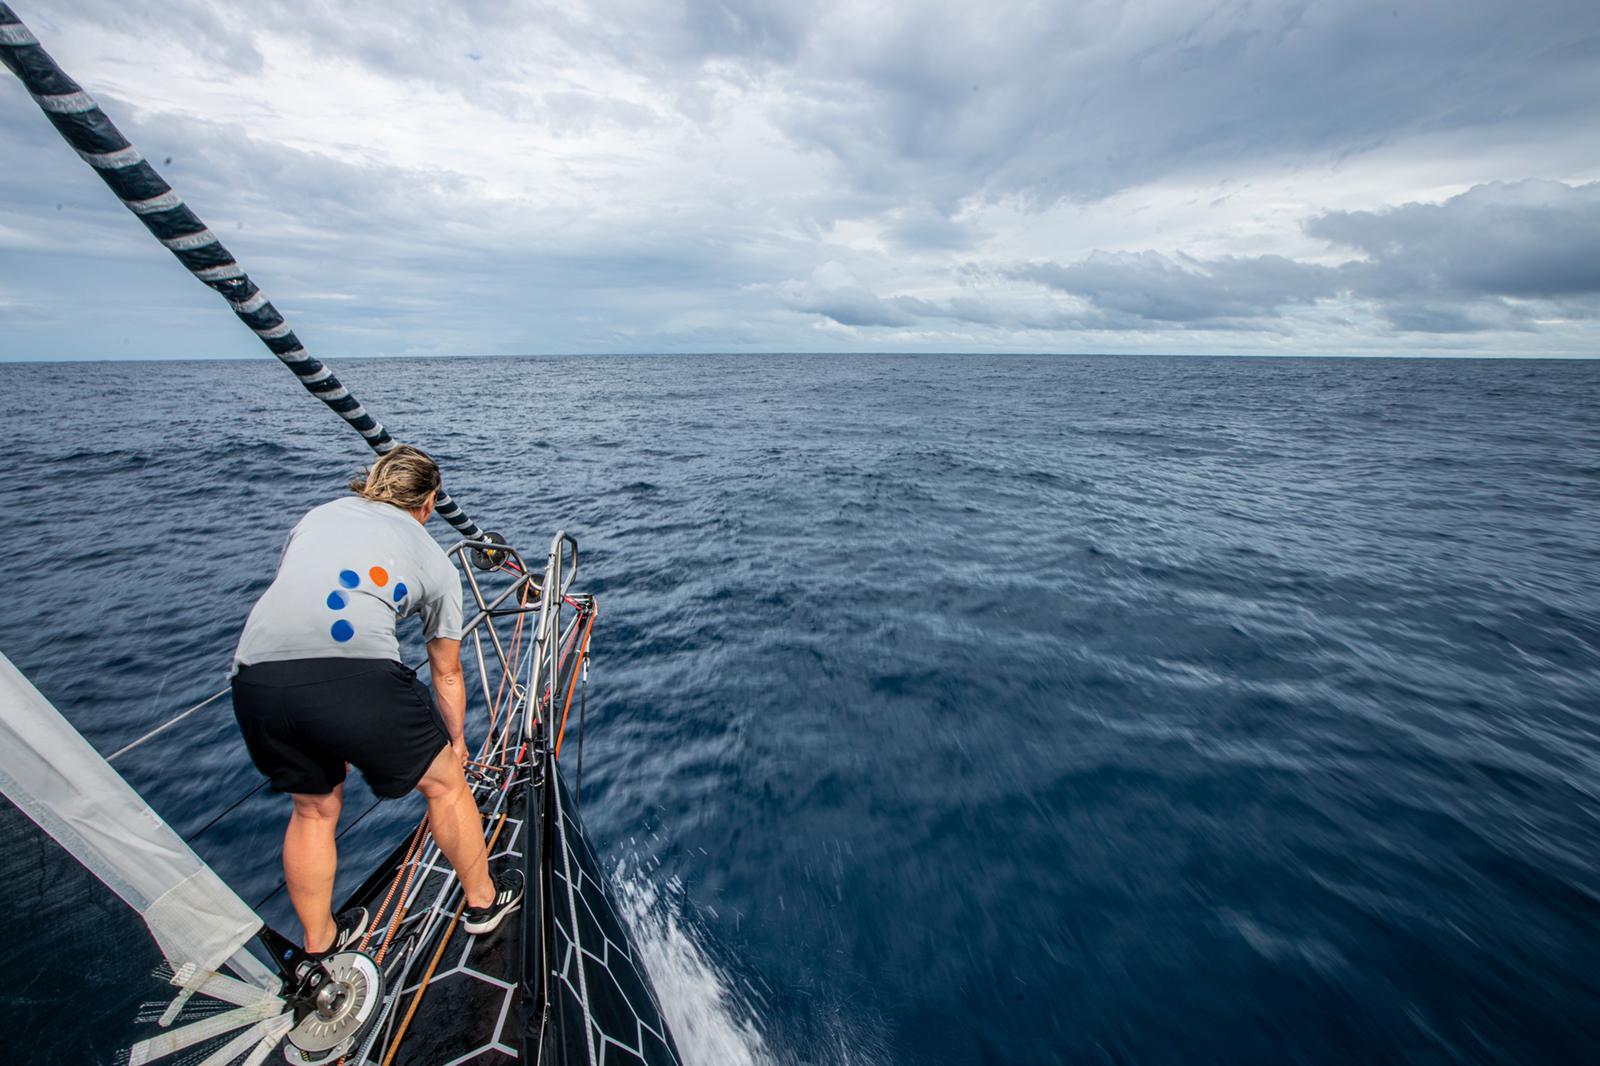 11th hour racing team transatlantic IMOCA 60 bow vast ocean